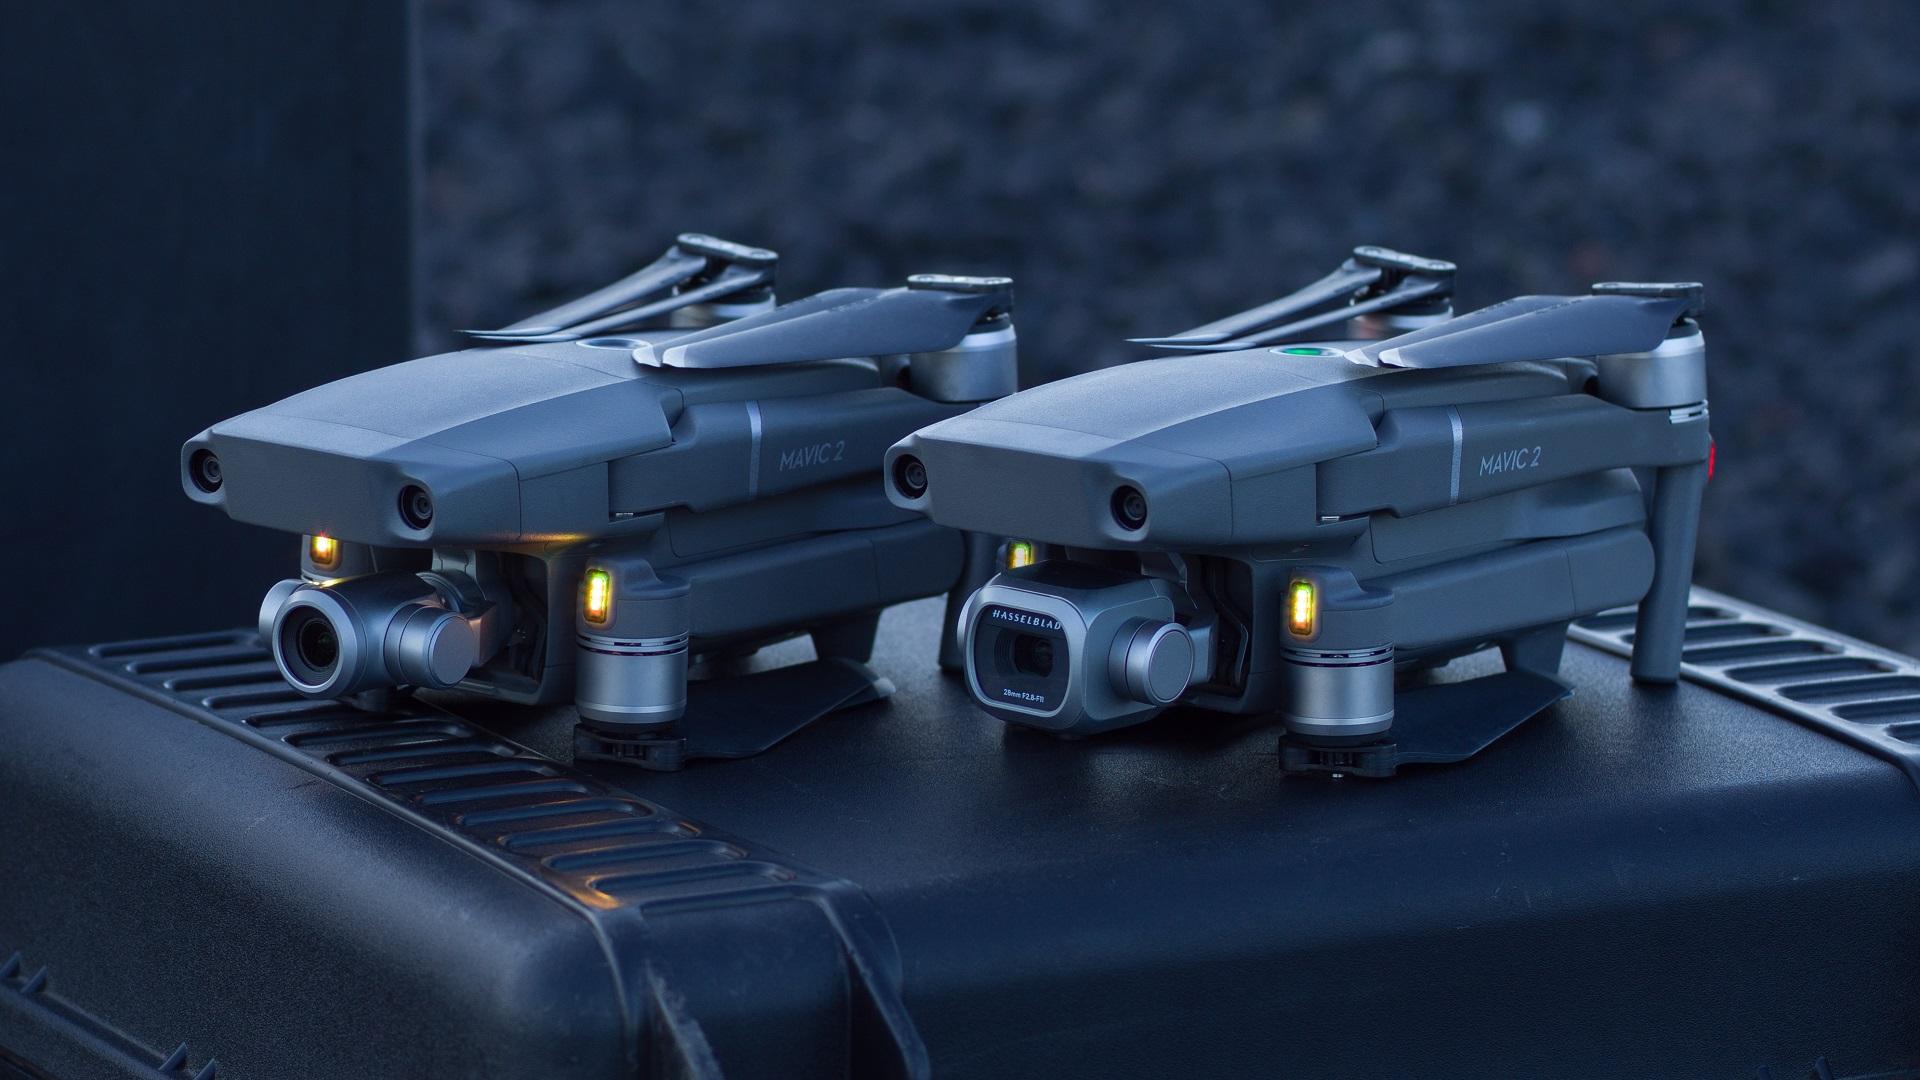 Nové drony DJI Mavic 2 za výjimečnou cenu u GearBestu! [sponzorovaný článek]